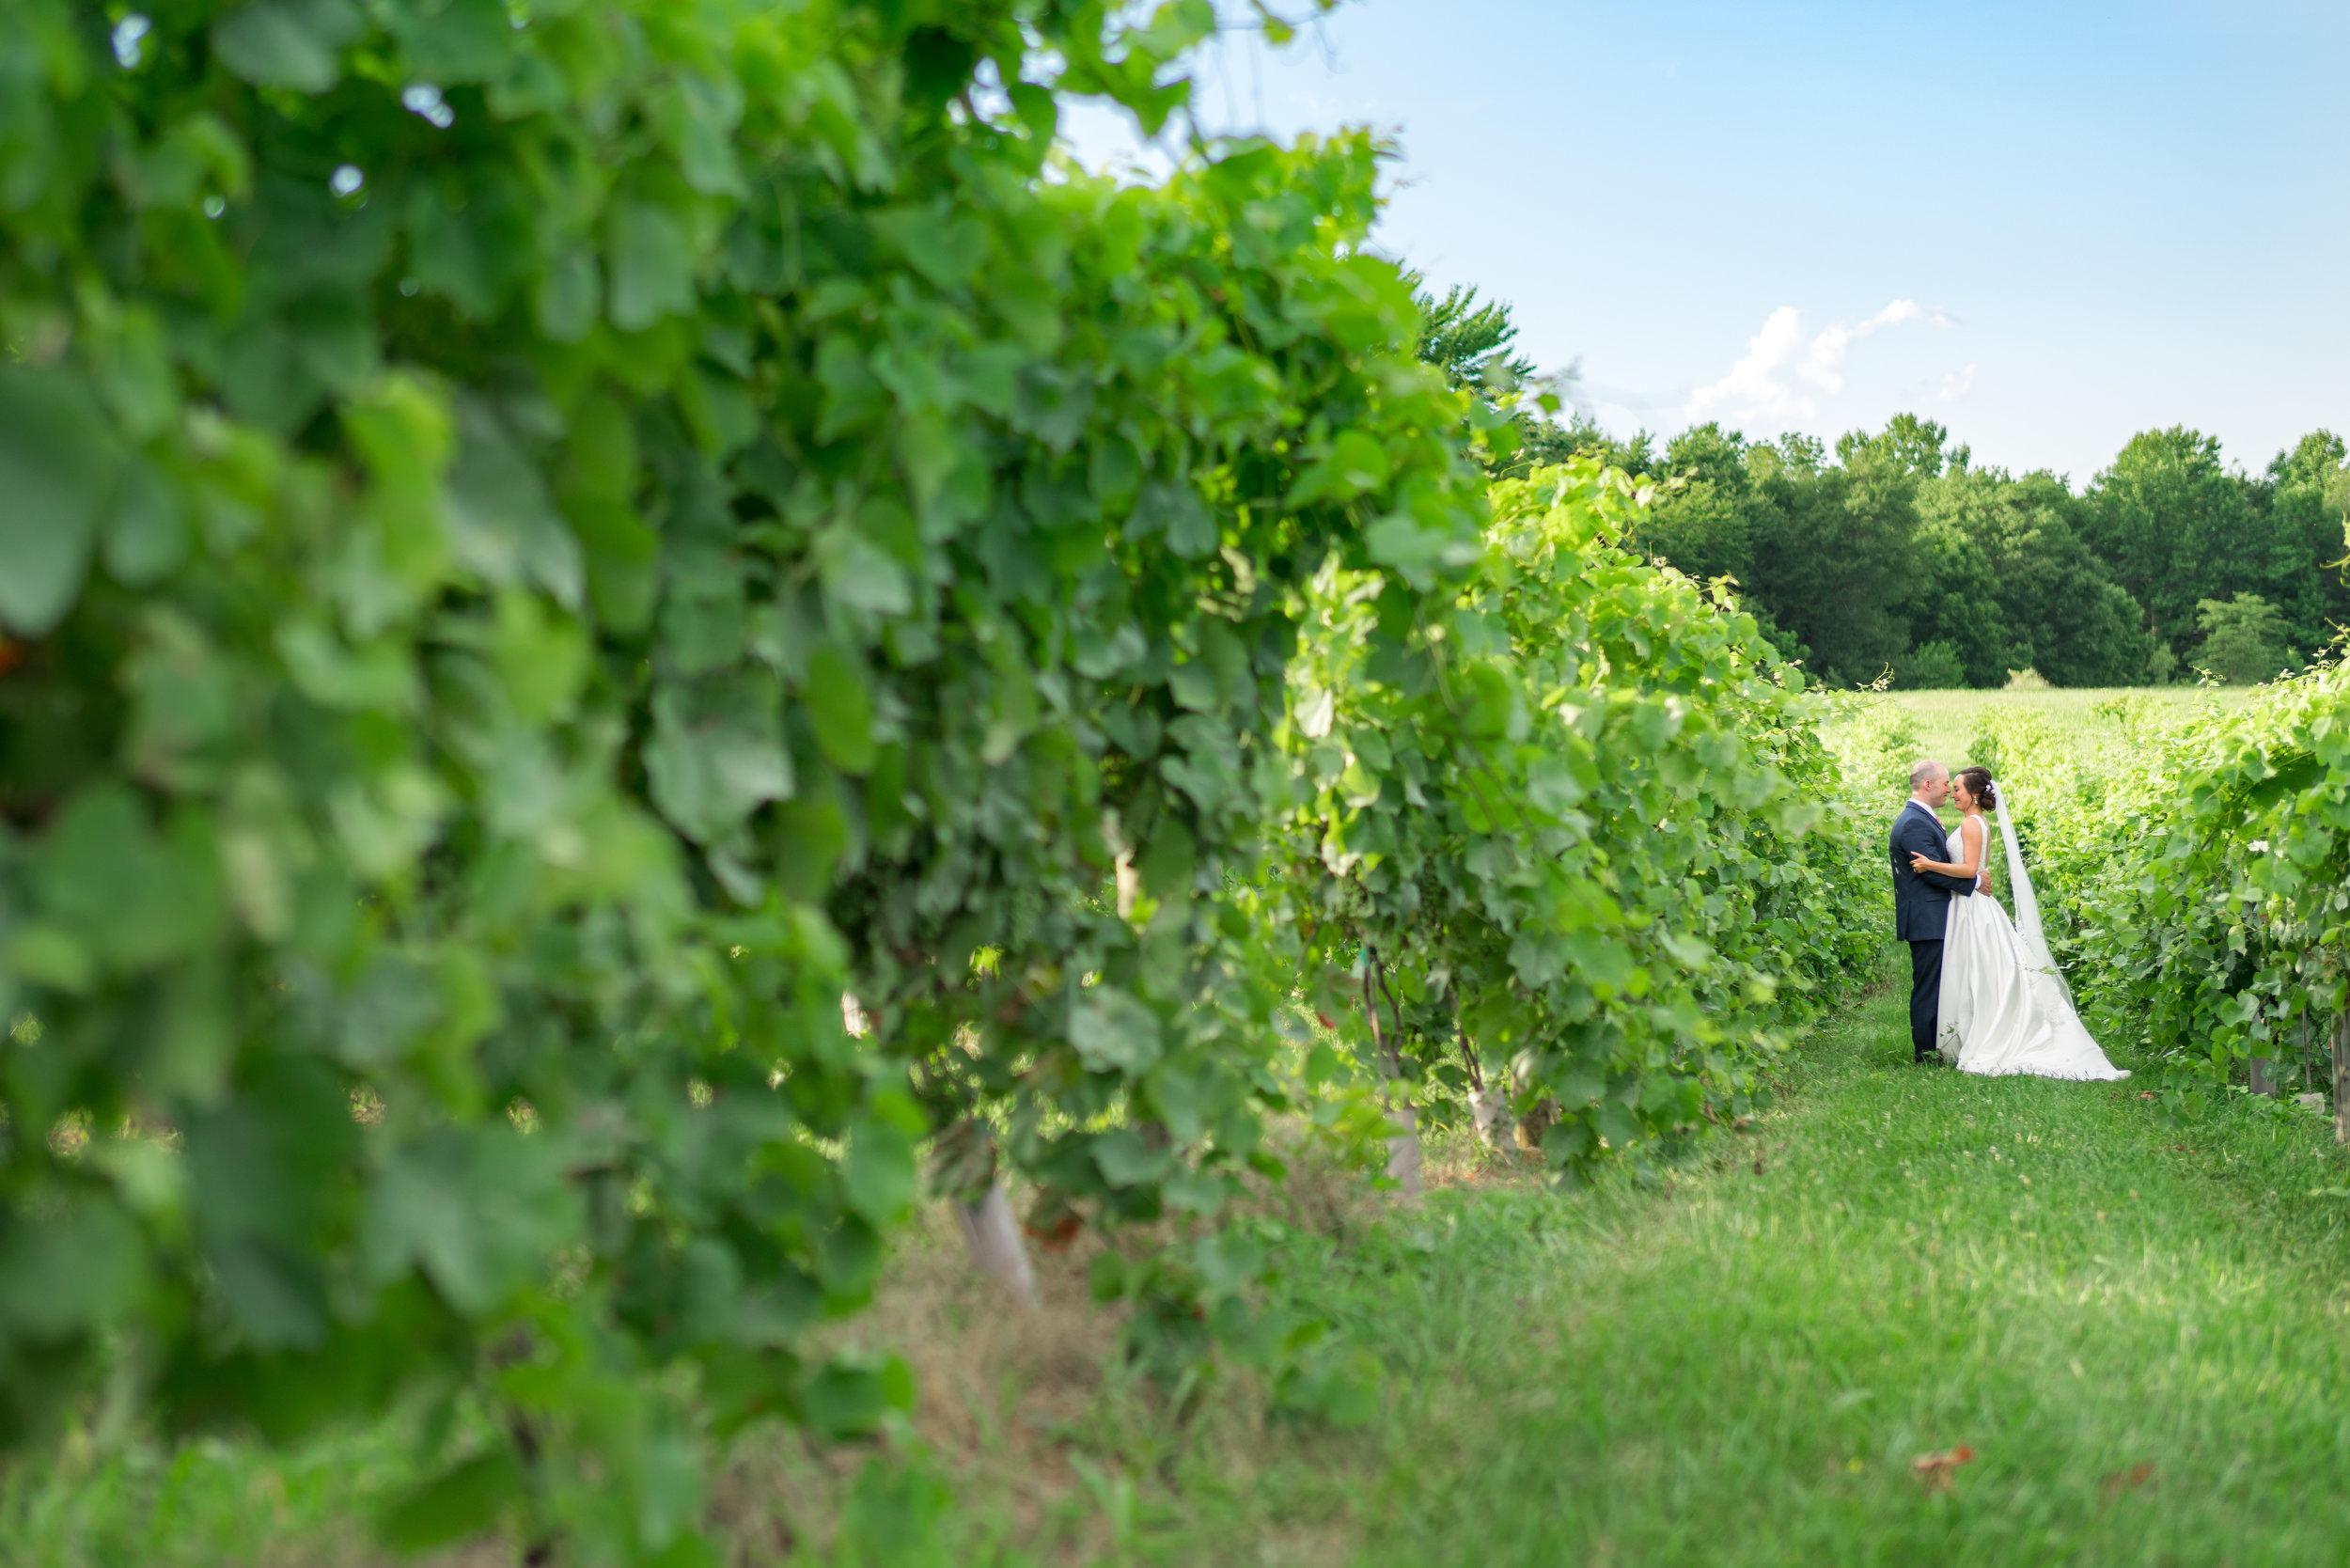 Summer July vineyard wedding in Virginia and Maryland